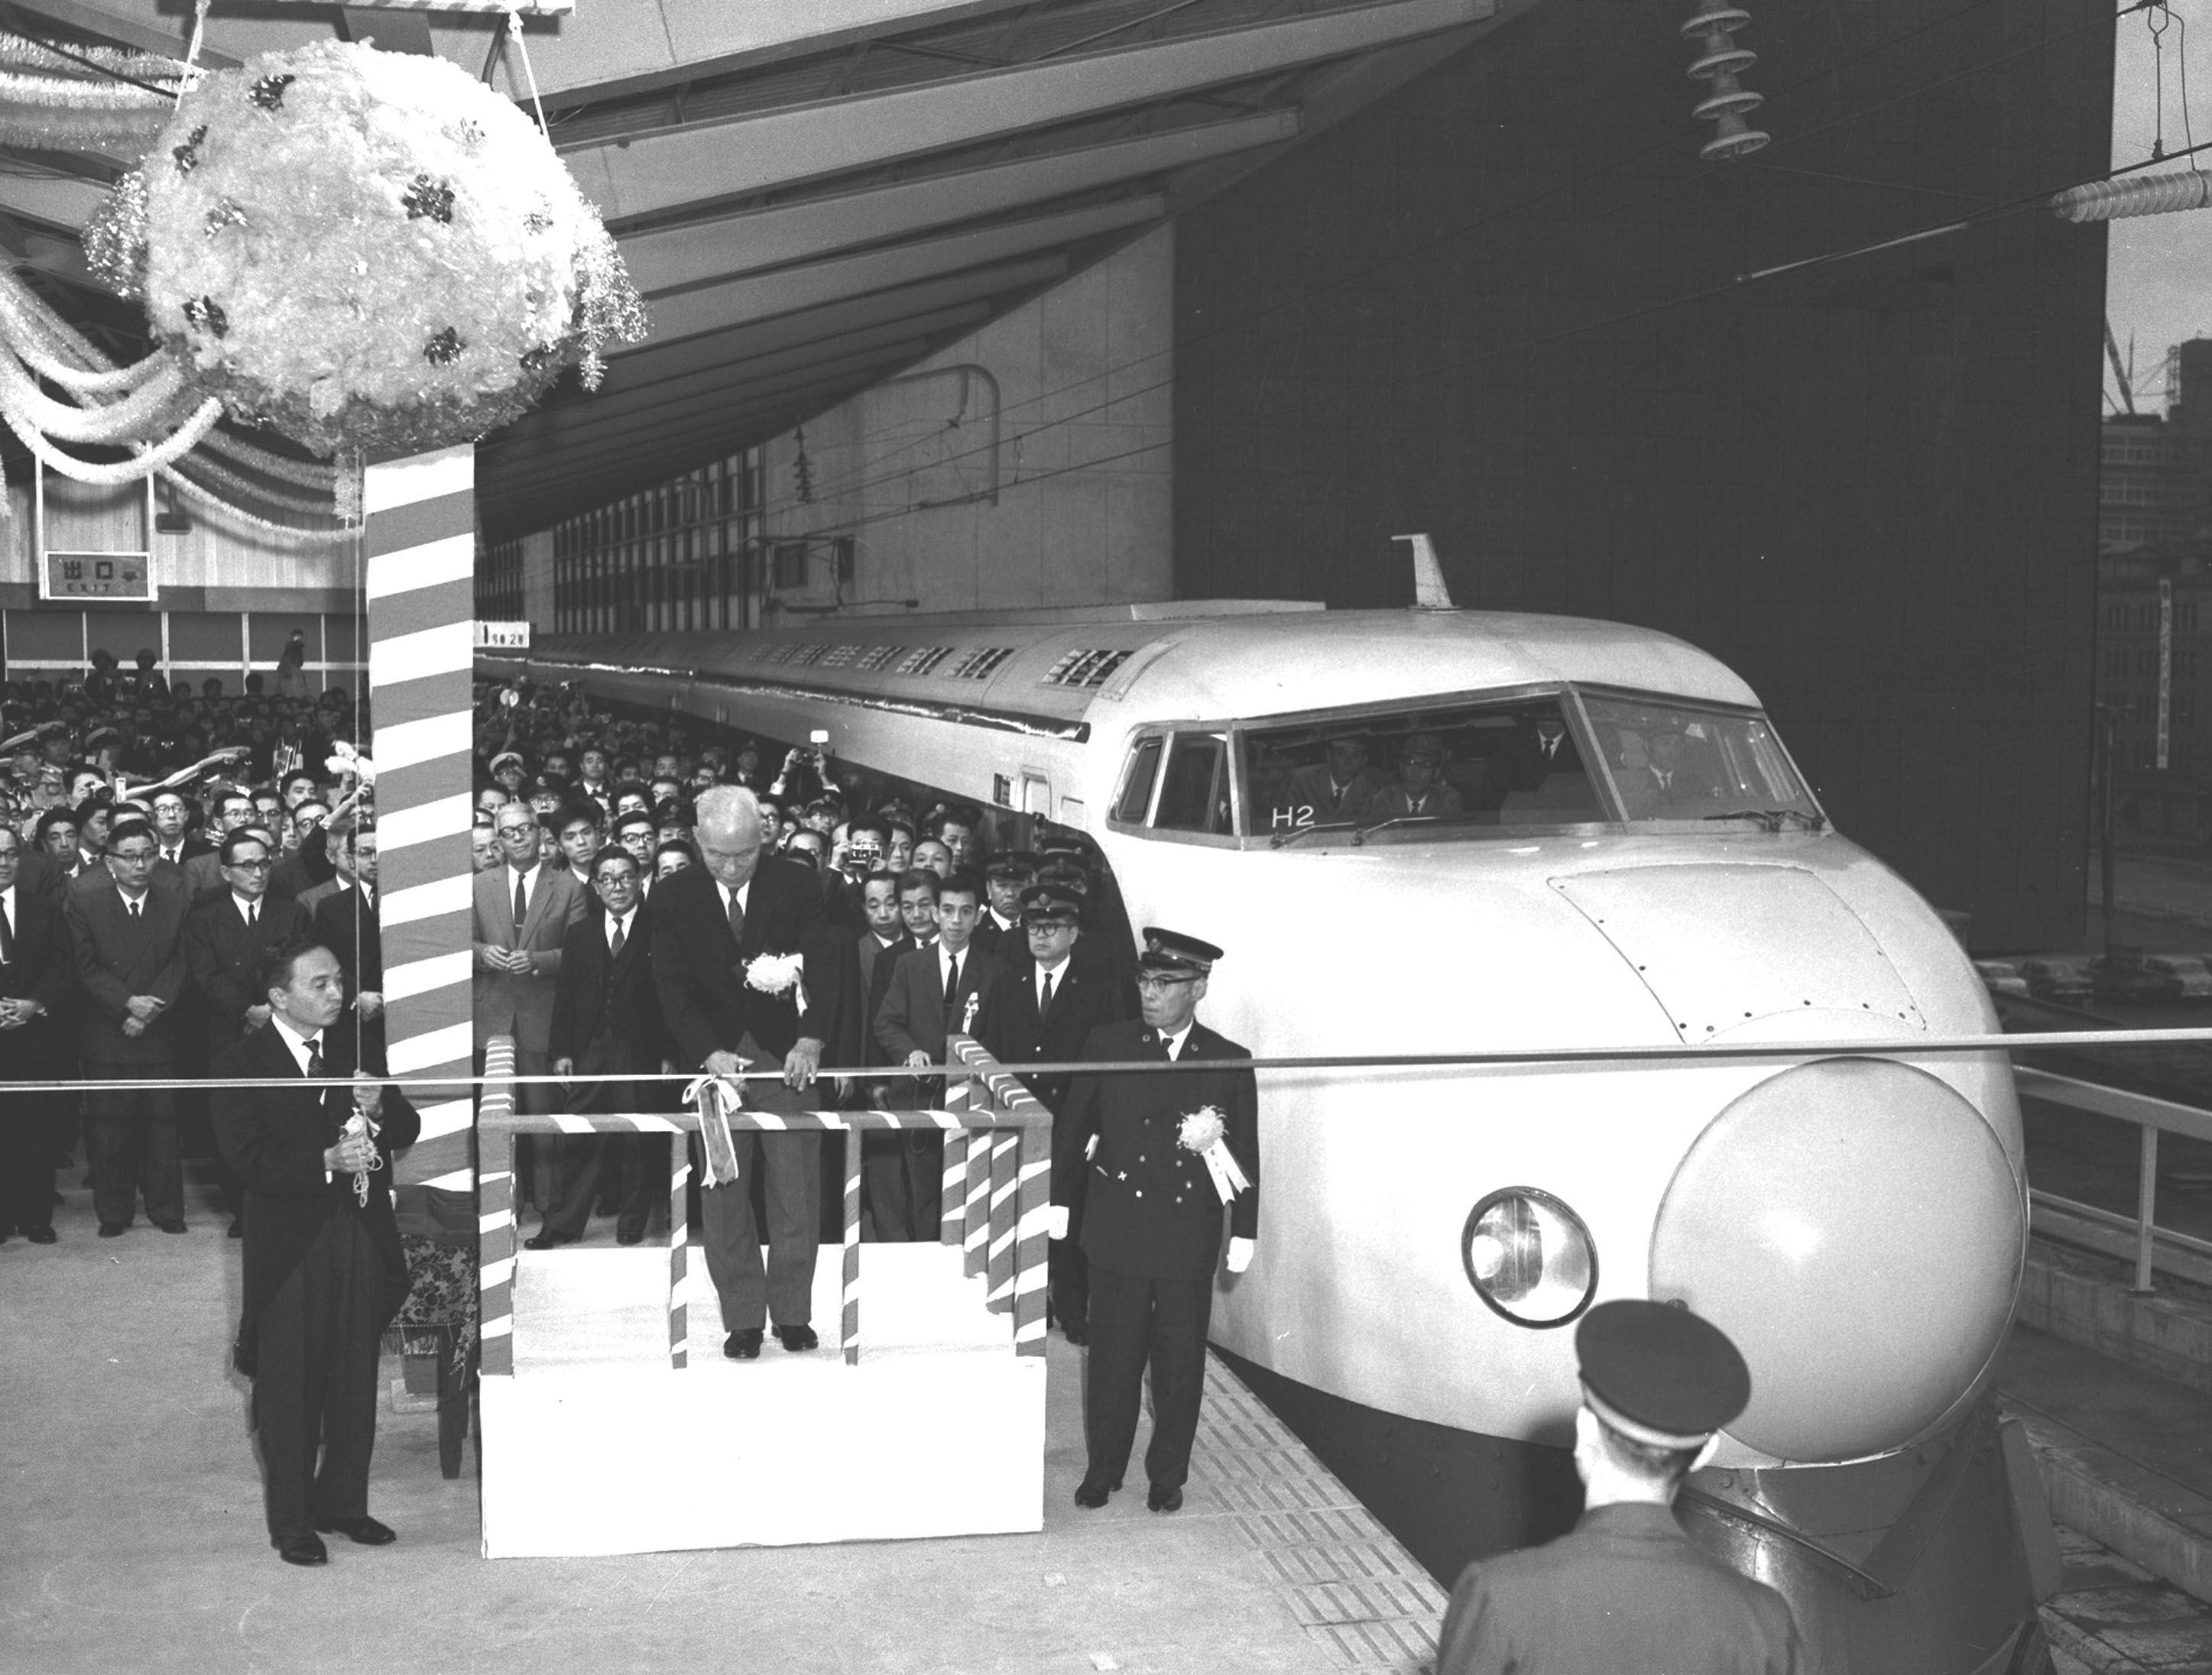 Tokaido Shinkansen Line gears up for 50th anniversary in